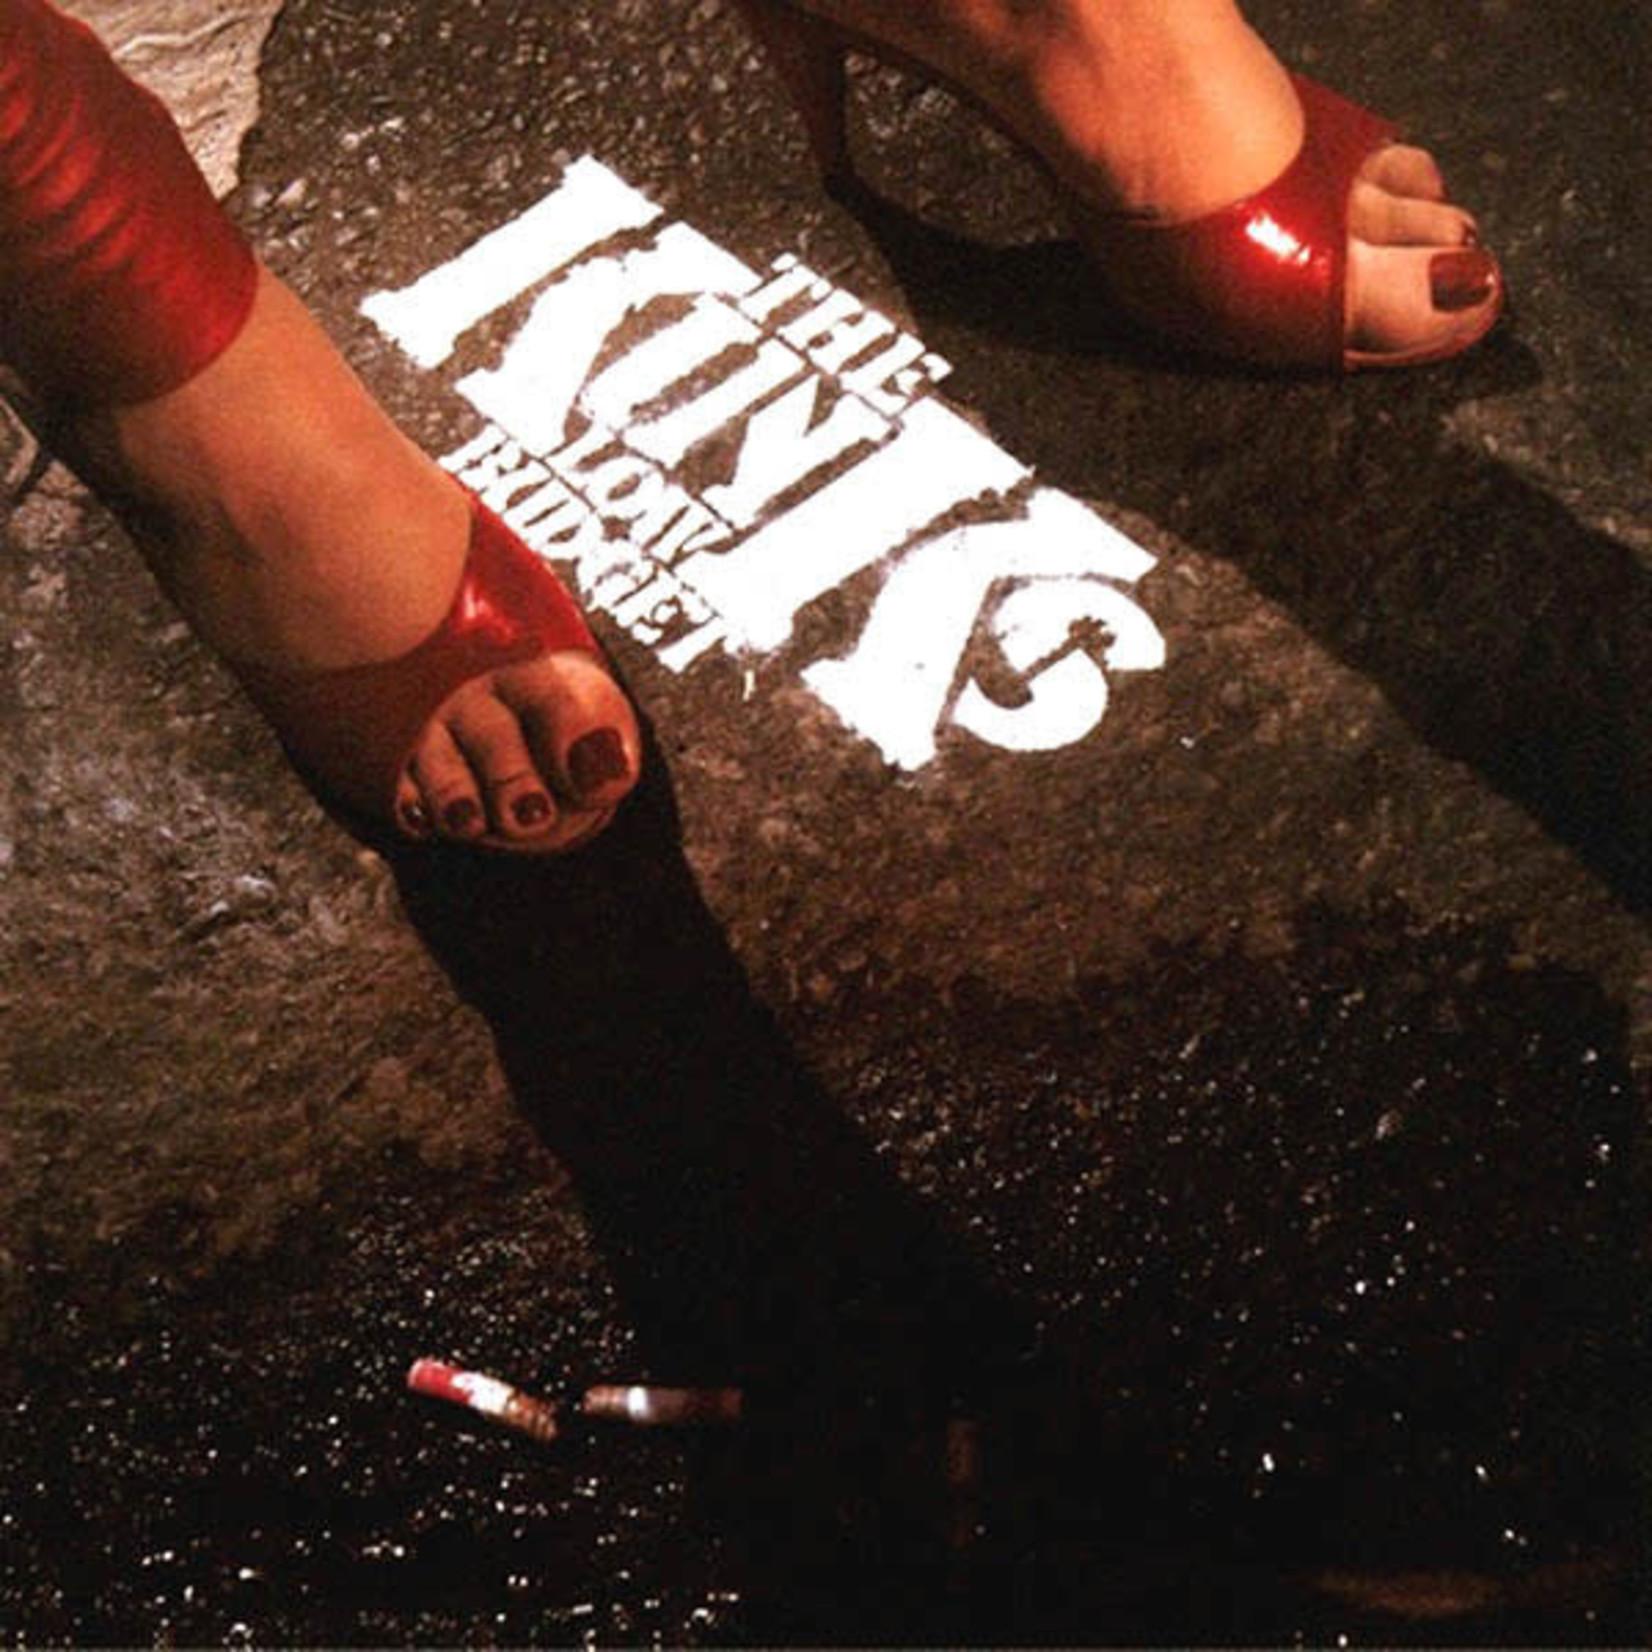 [Vintage] Kinks: Low Budget